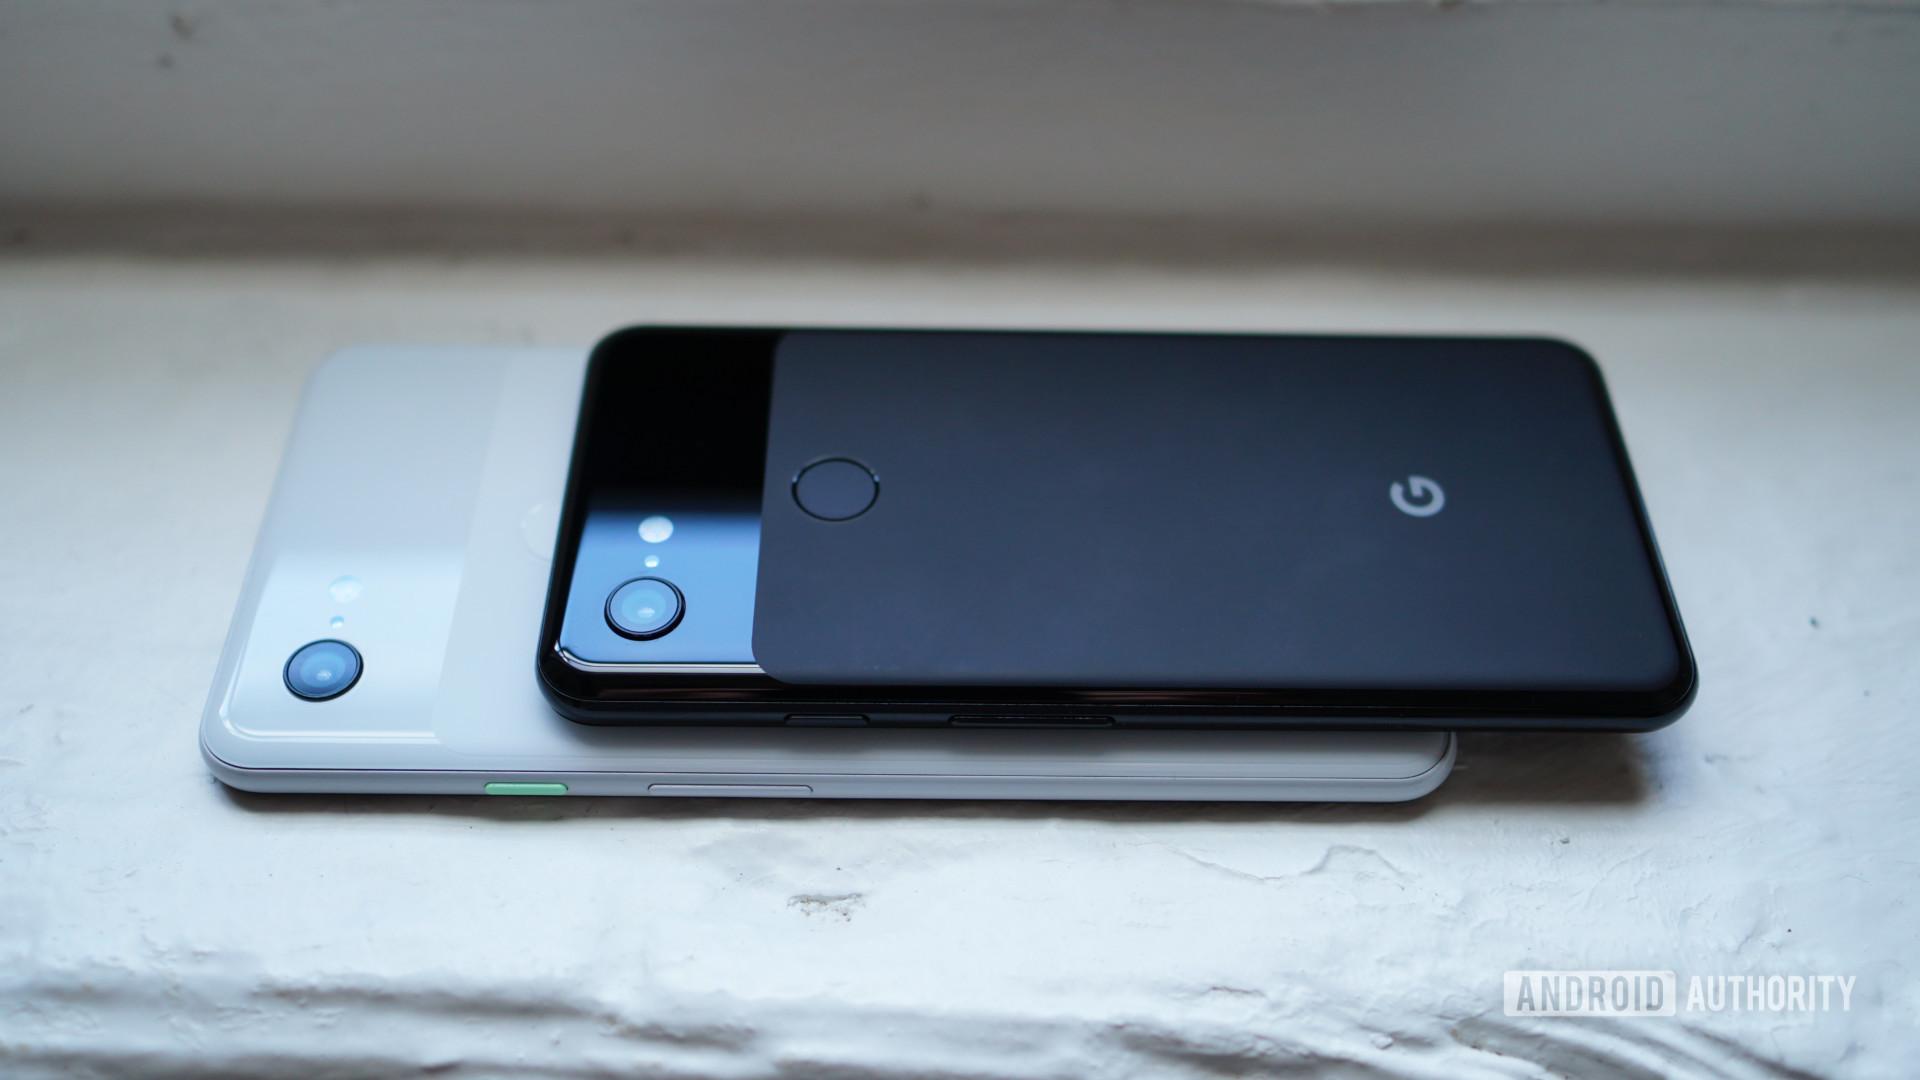 Google Pixel 3 and Pixel 3 XL design